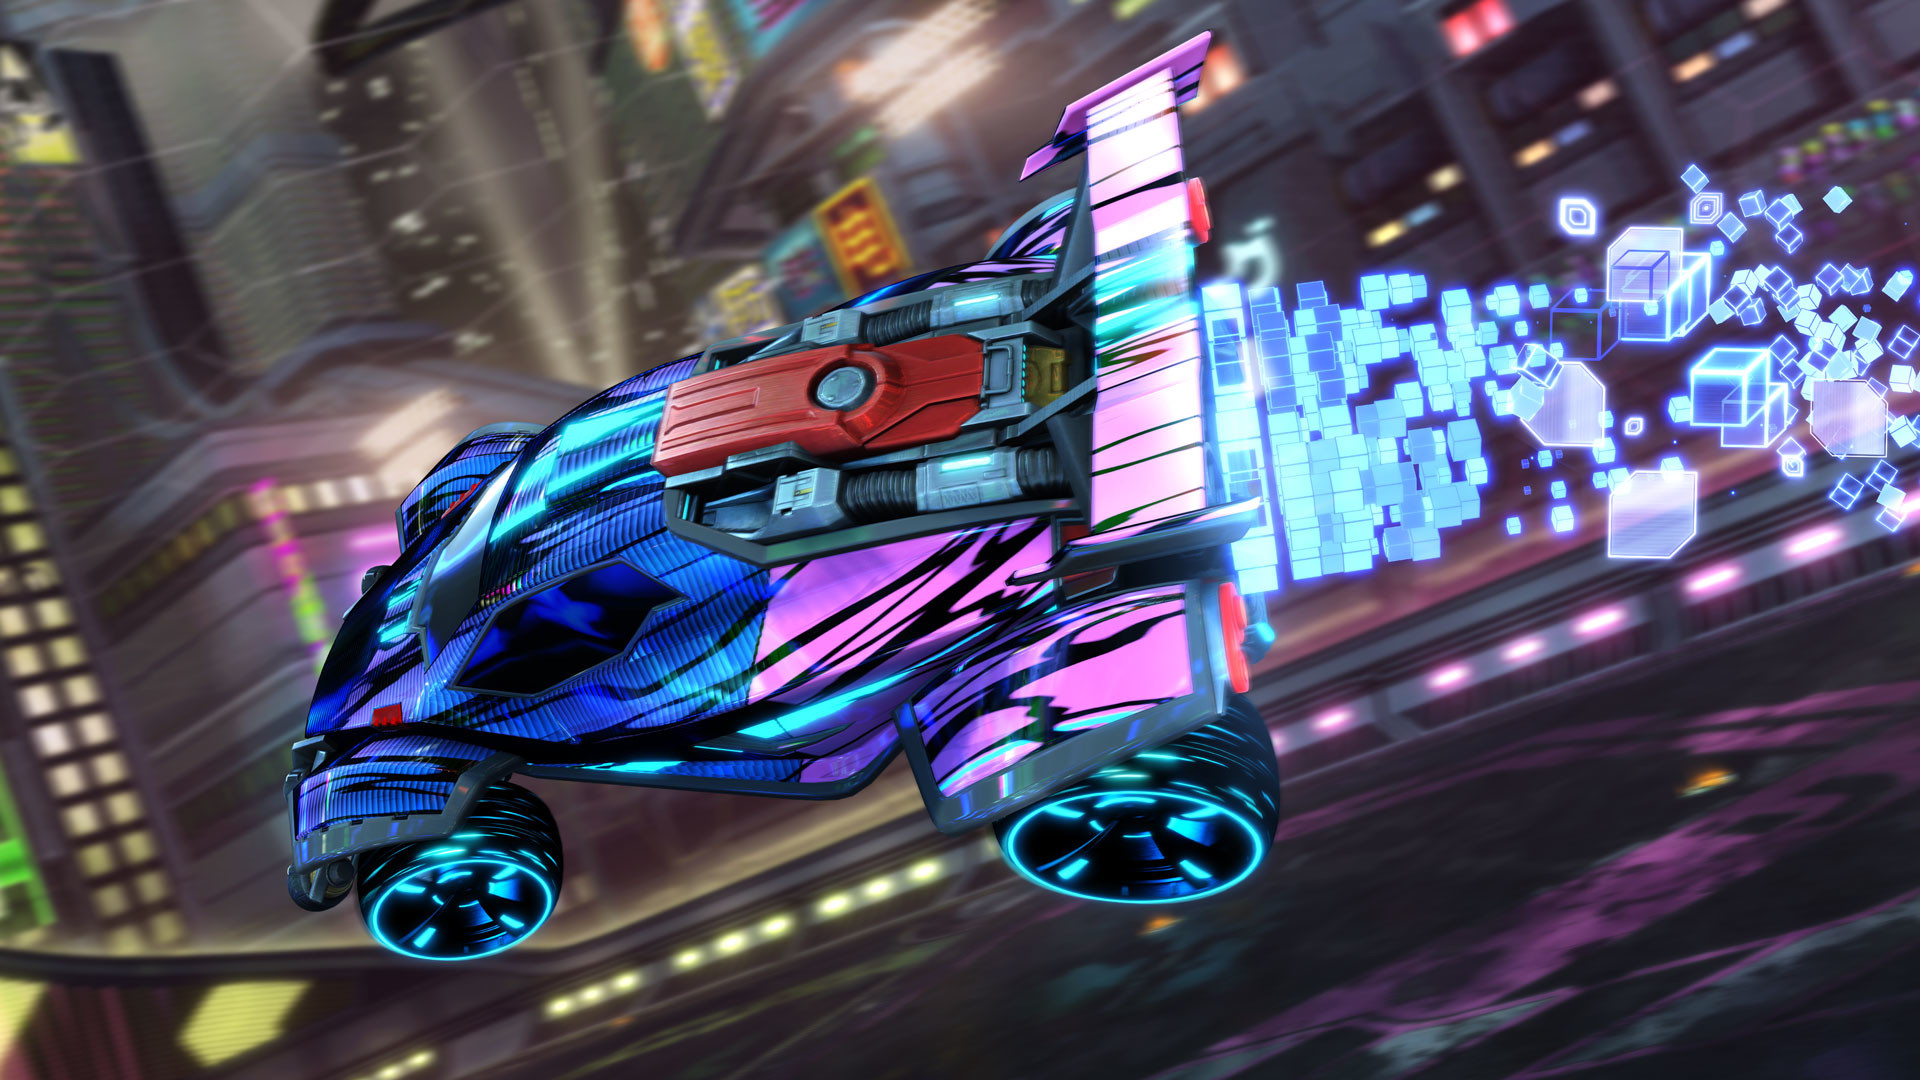 KHAiHOM.com - Rocket League®